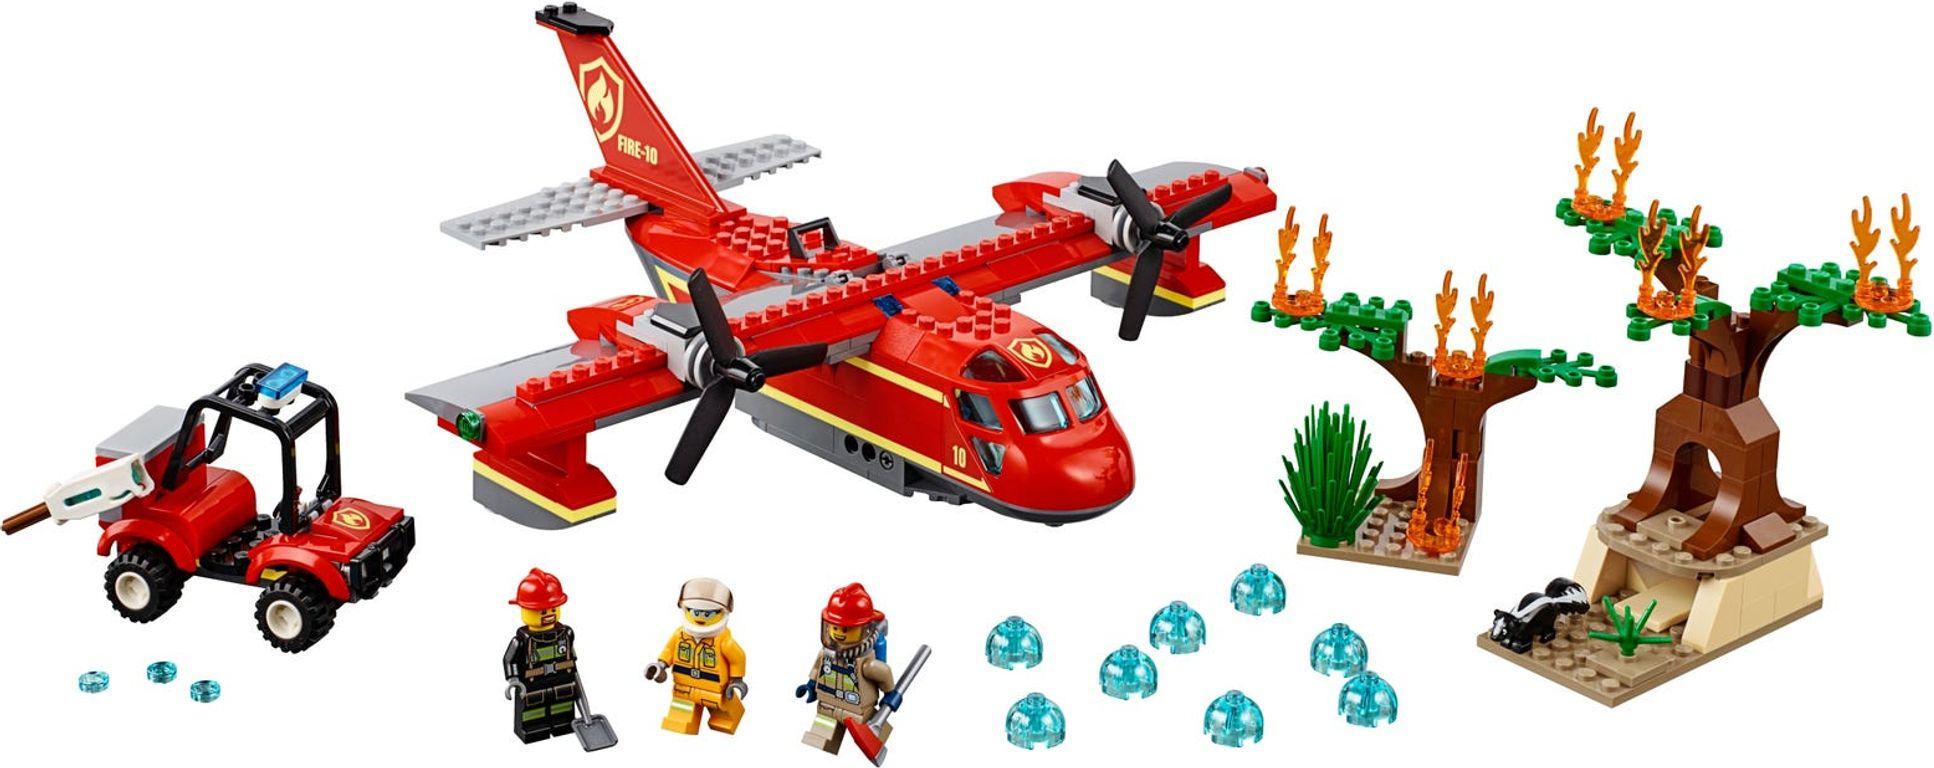 LEGO® City Fire Plane components